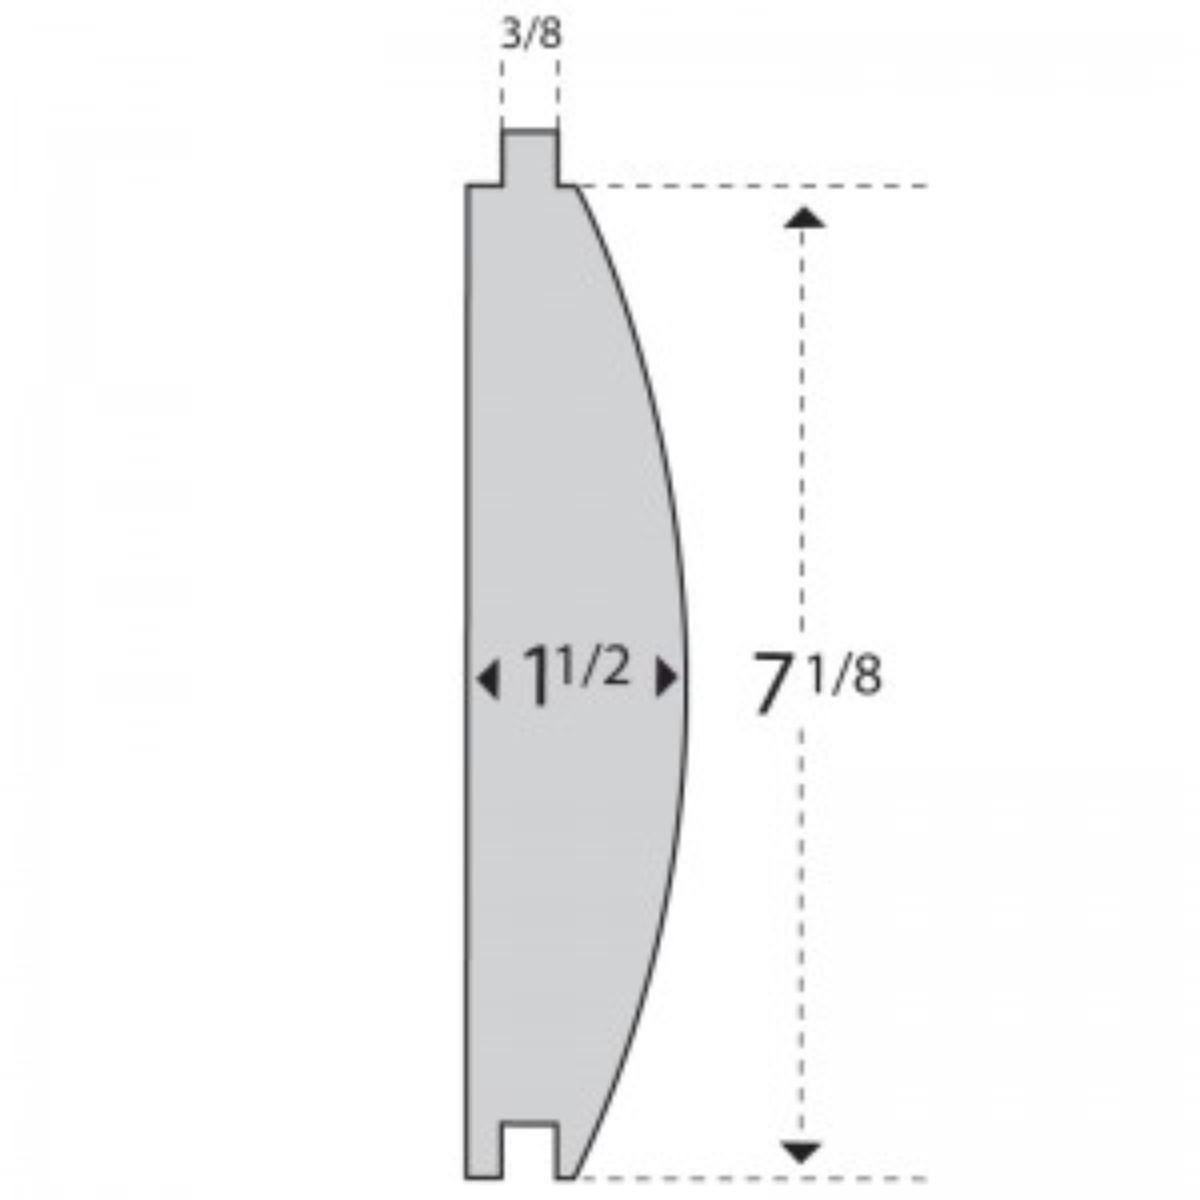 illustration of cross section of log siding